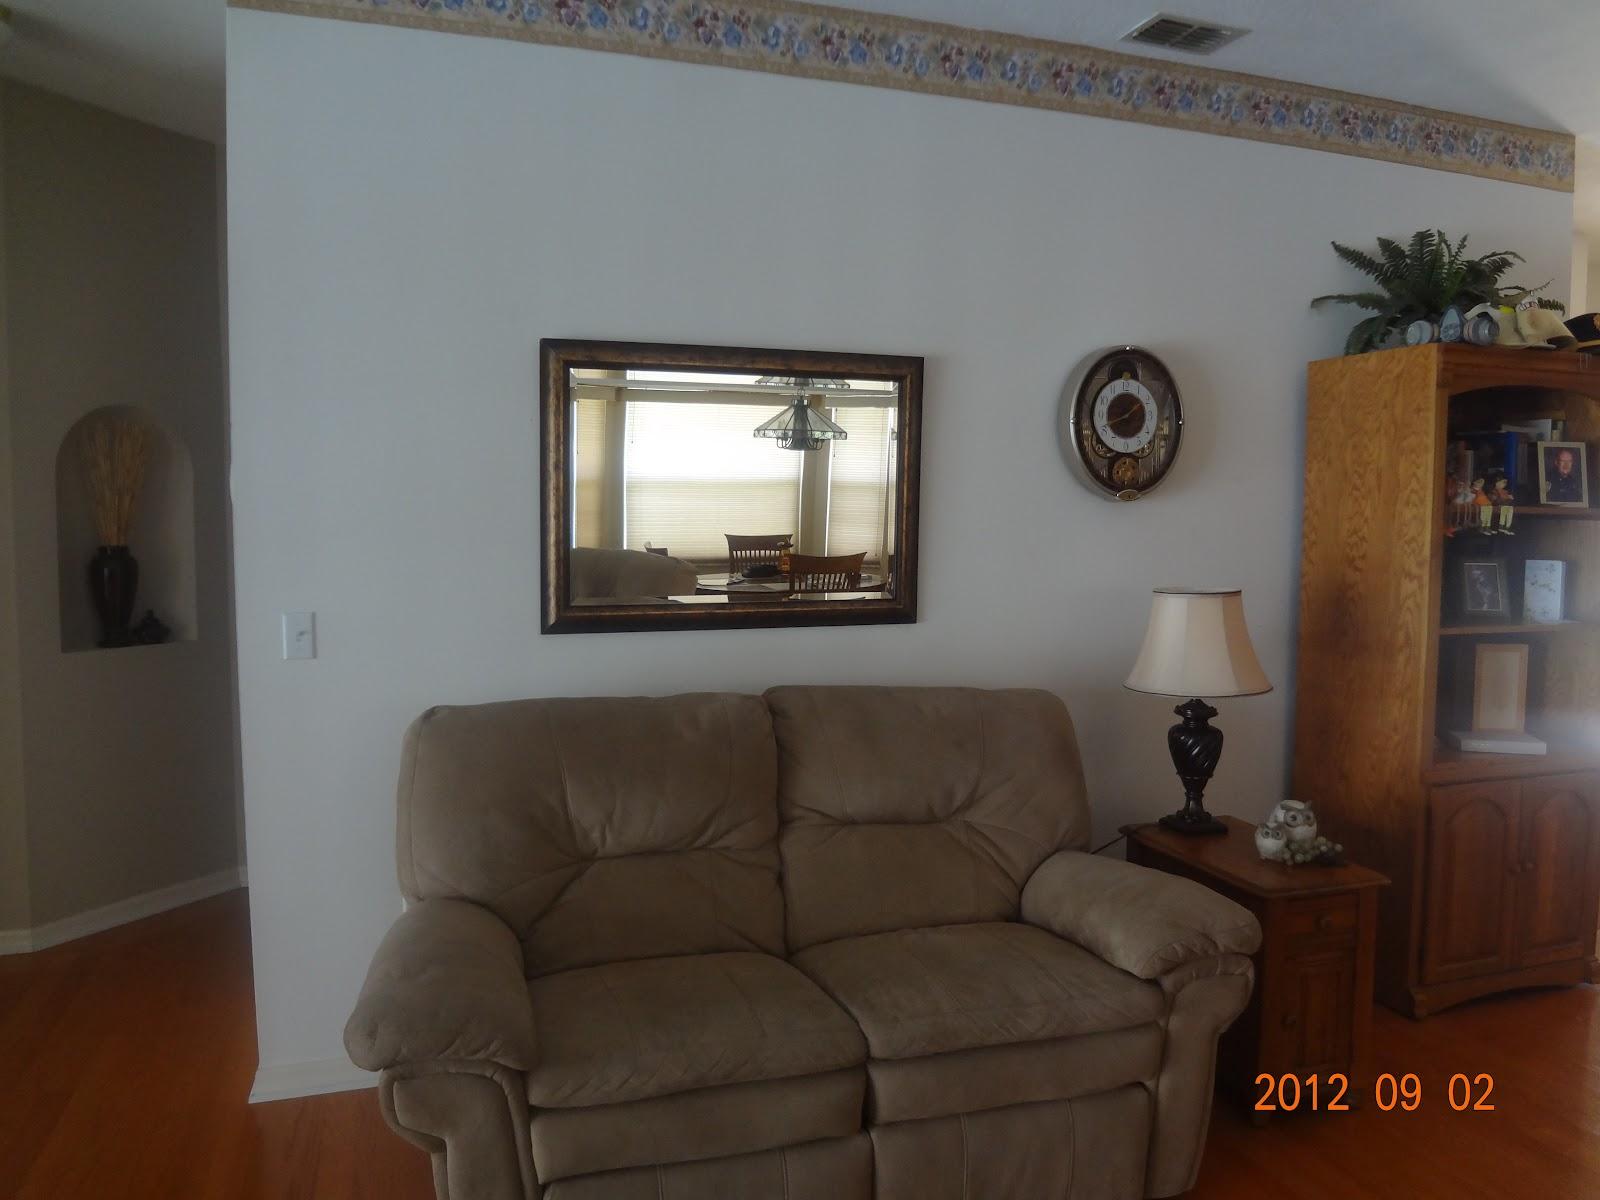 http://3.bp.blogspot.com/-2LaEdLkg1ow/UEVpVBZ6eZI/AAAAAAAAA0I/kEsI0OmE6I8/s1600/living+room+before+painting.jpg